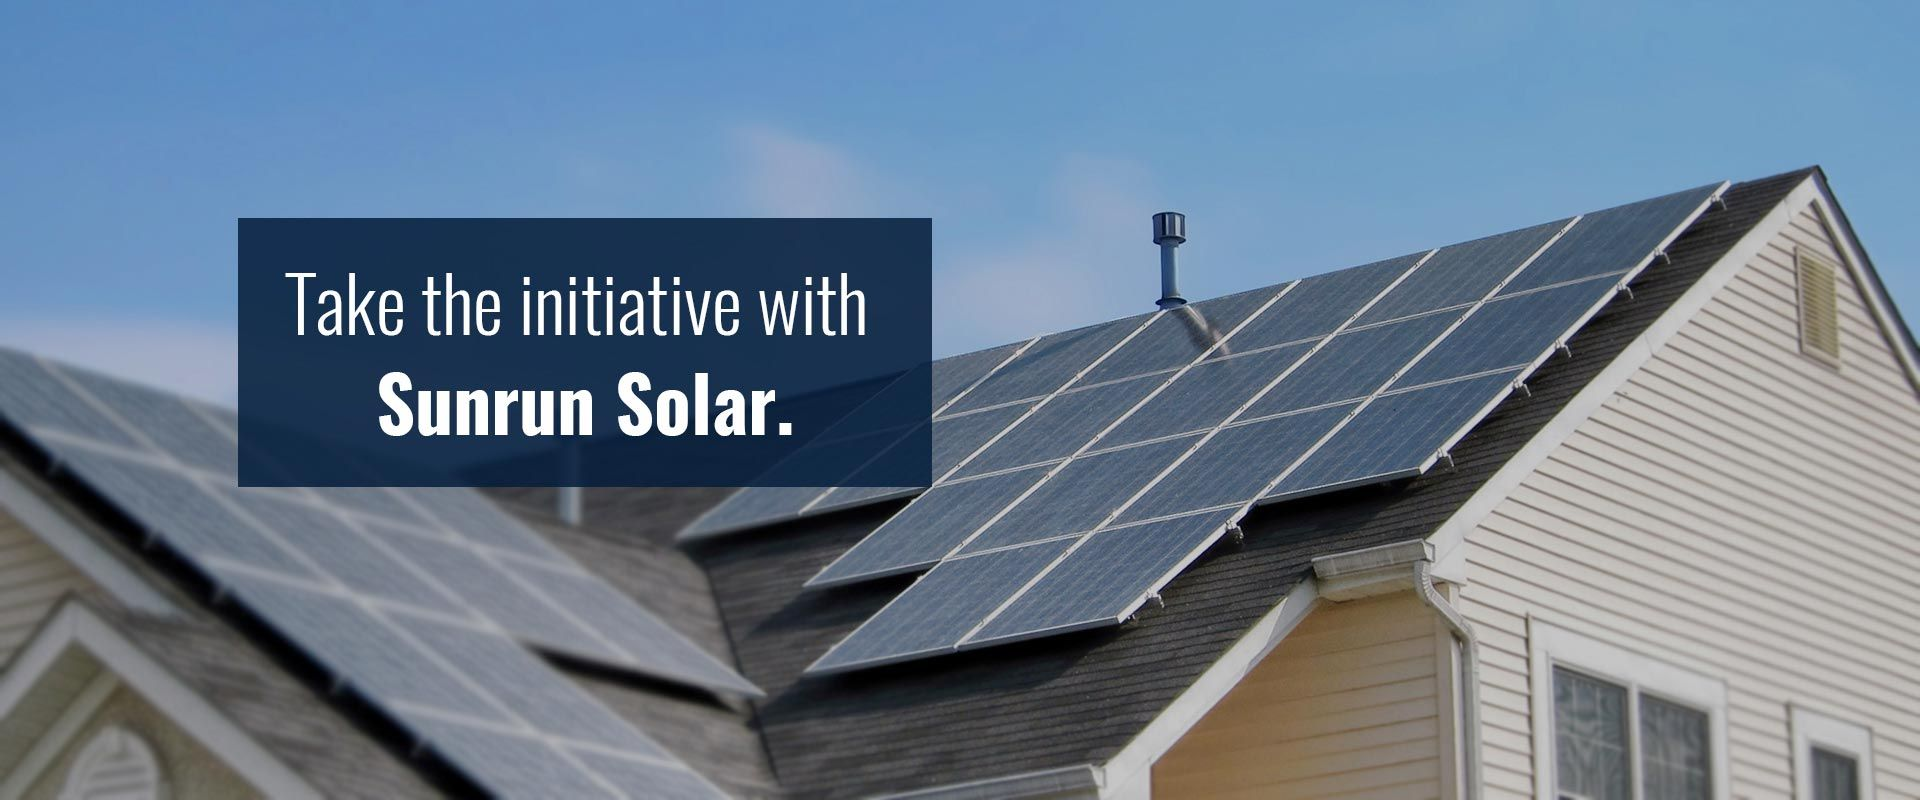 Solar Panels Melbourne Solar Power Solar Energy Melbourne Victoria Australia Solar Solar Energy Facts Solar Panels